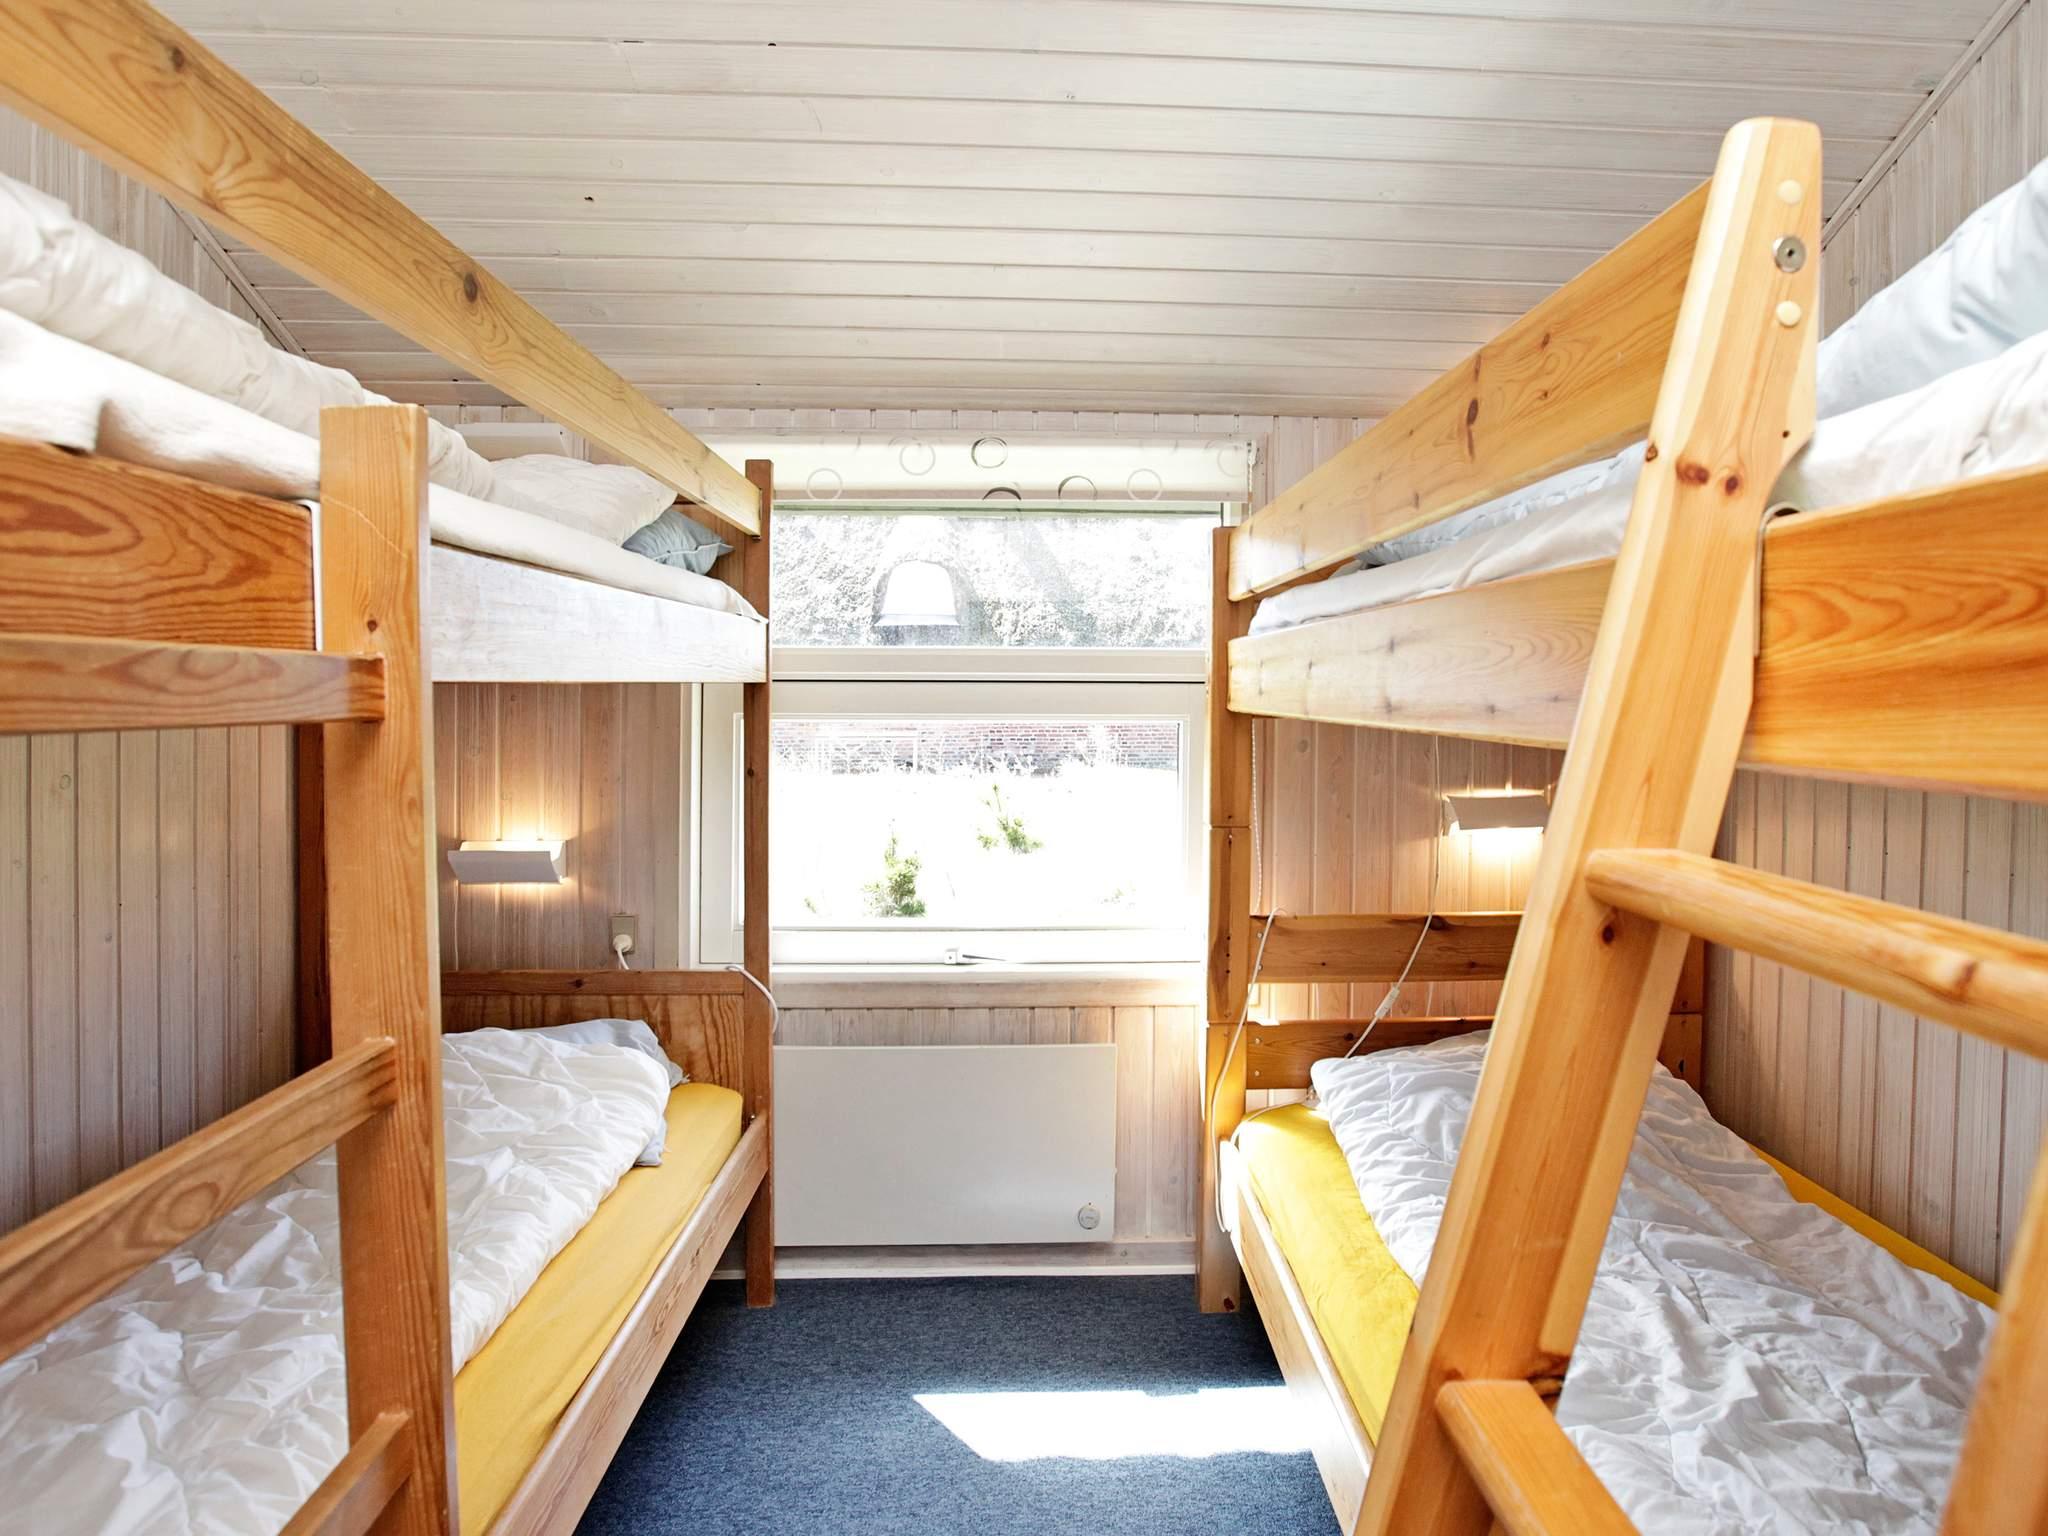 Ferienhaus Blåvand (88586), Blåvand, , Westjütland, Dänemark, Bild 12